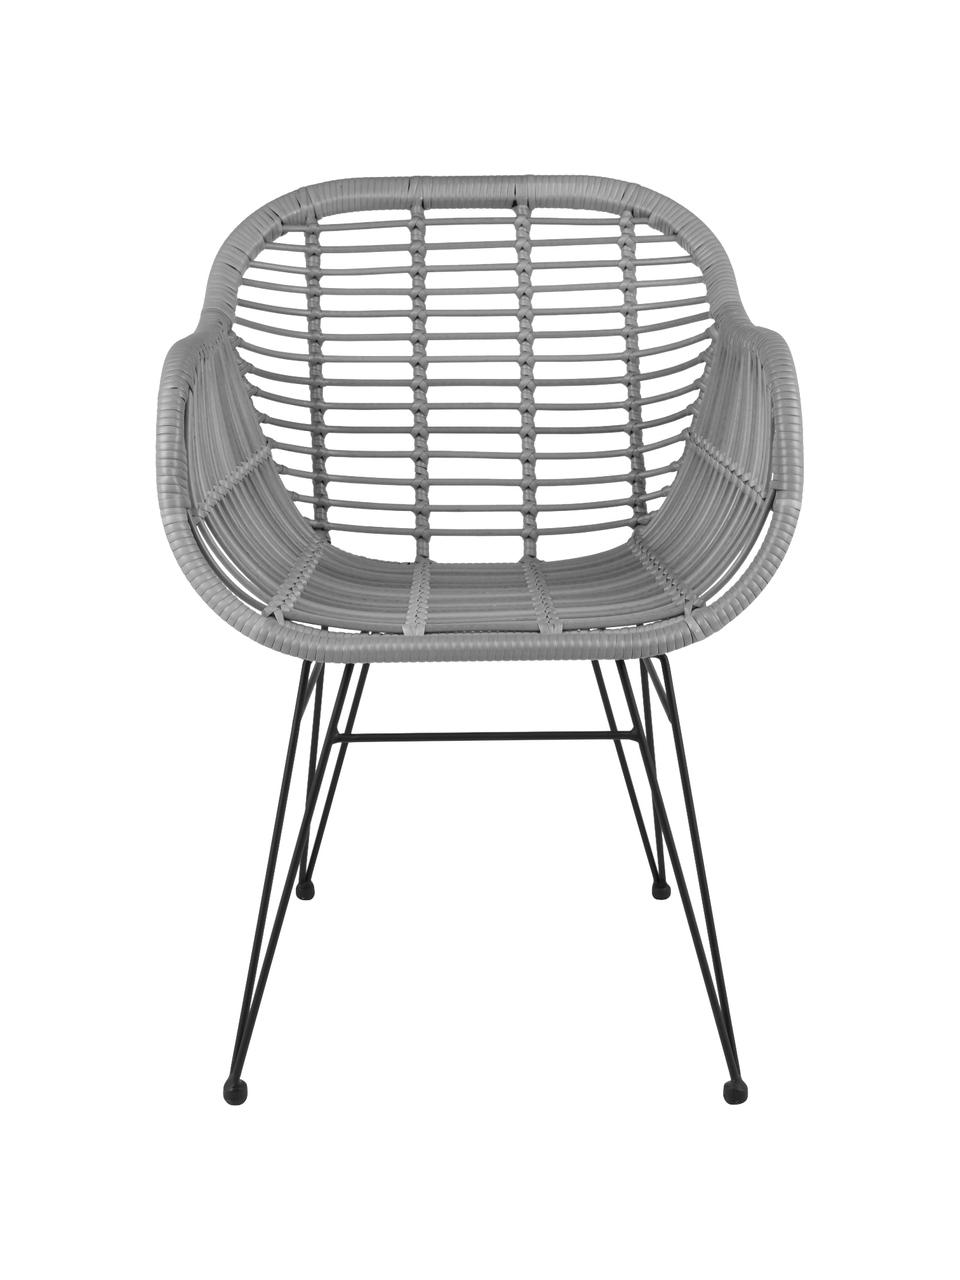 Polyrattan-Armlehnstühle Costa, 2 Stück, Sitzfläche: Polyethylen-Geflecht, Gestell: Metall, pulverbeschichtet, Grau, Schwarz, B 59 x T 58 cm